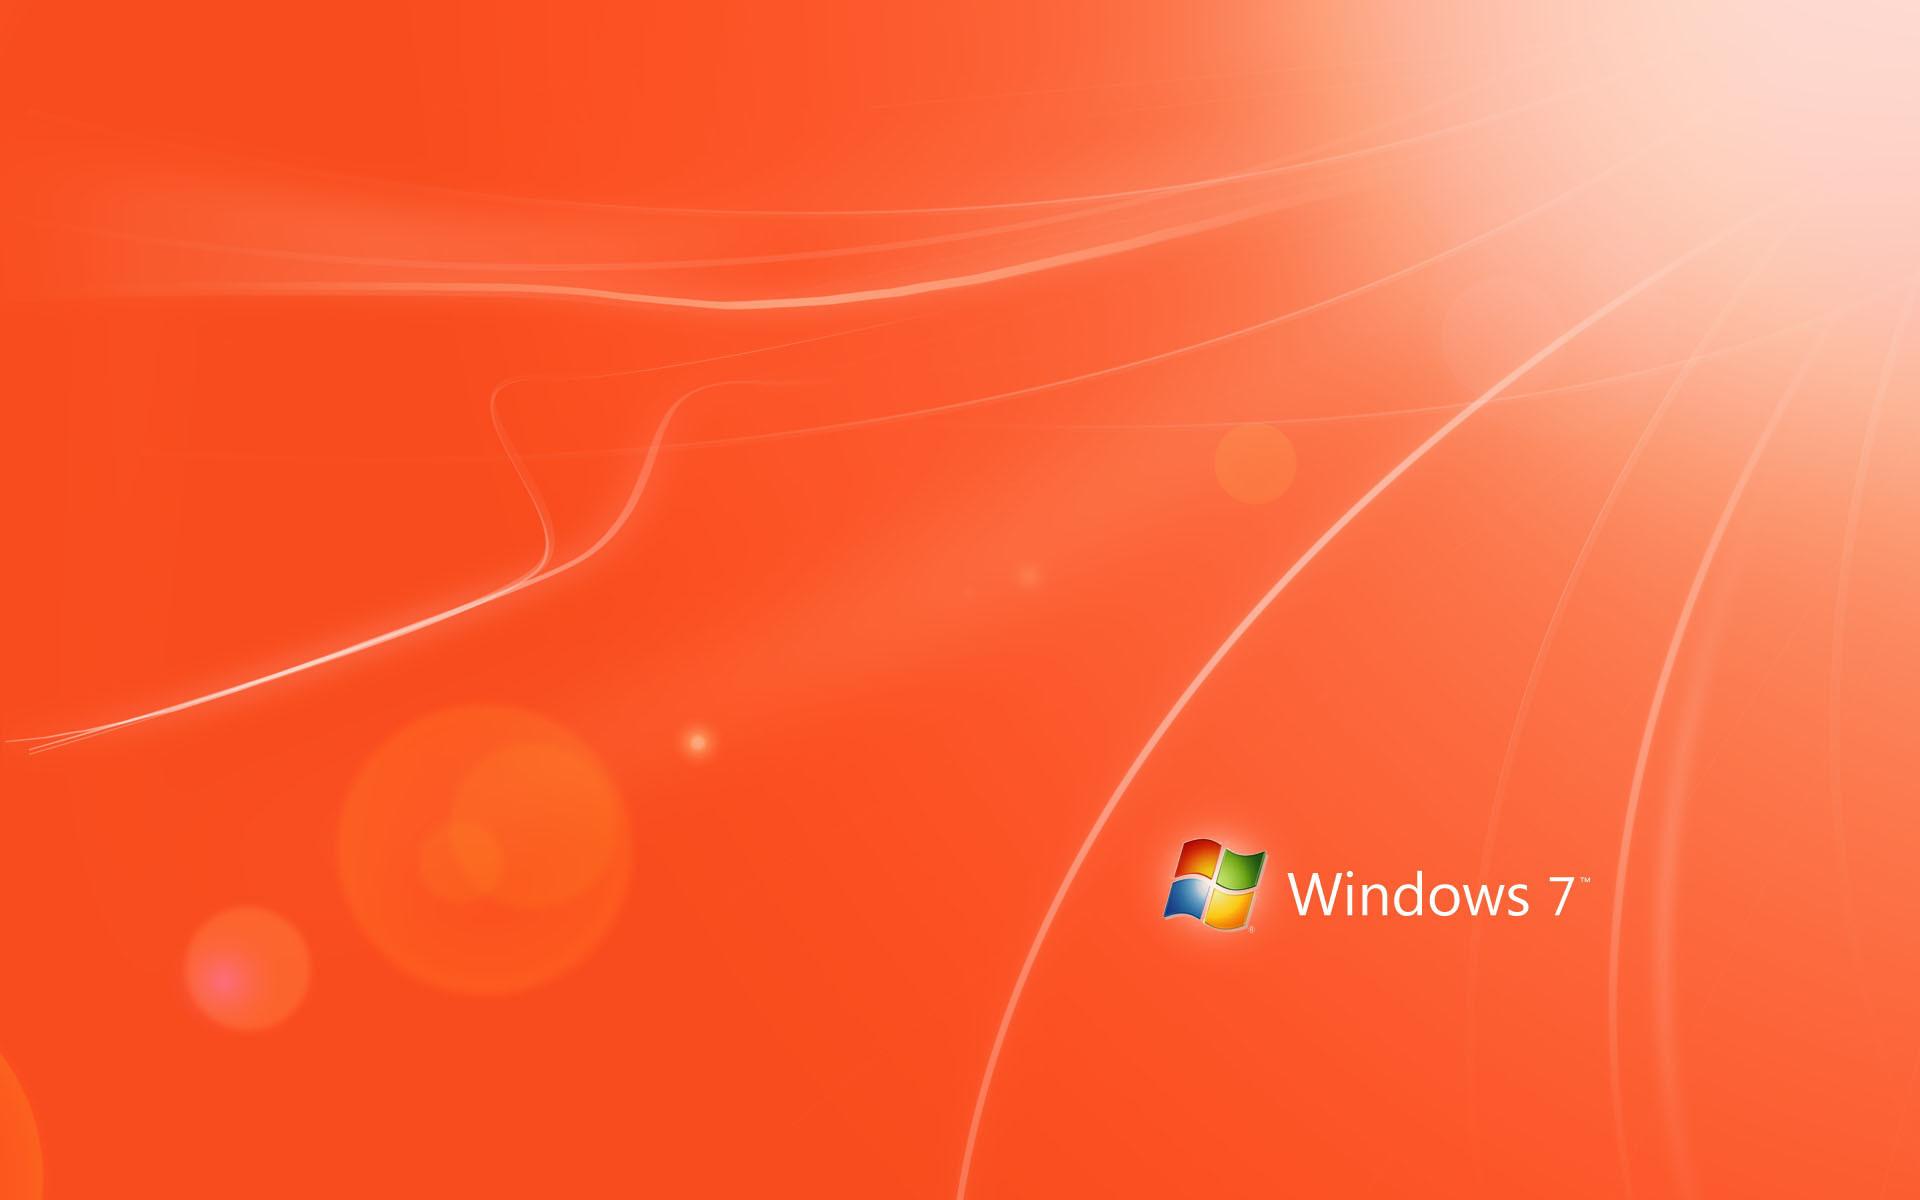 Orange Windows 7 Wallpapers   HD Wallpapers